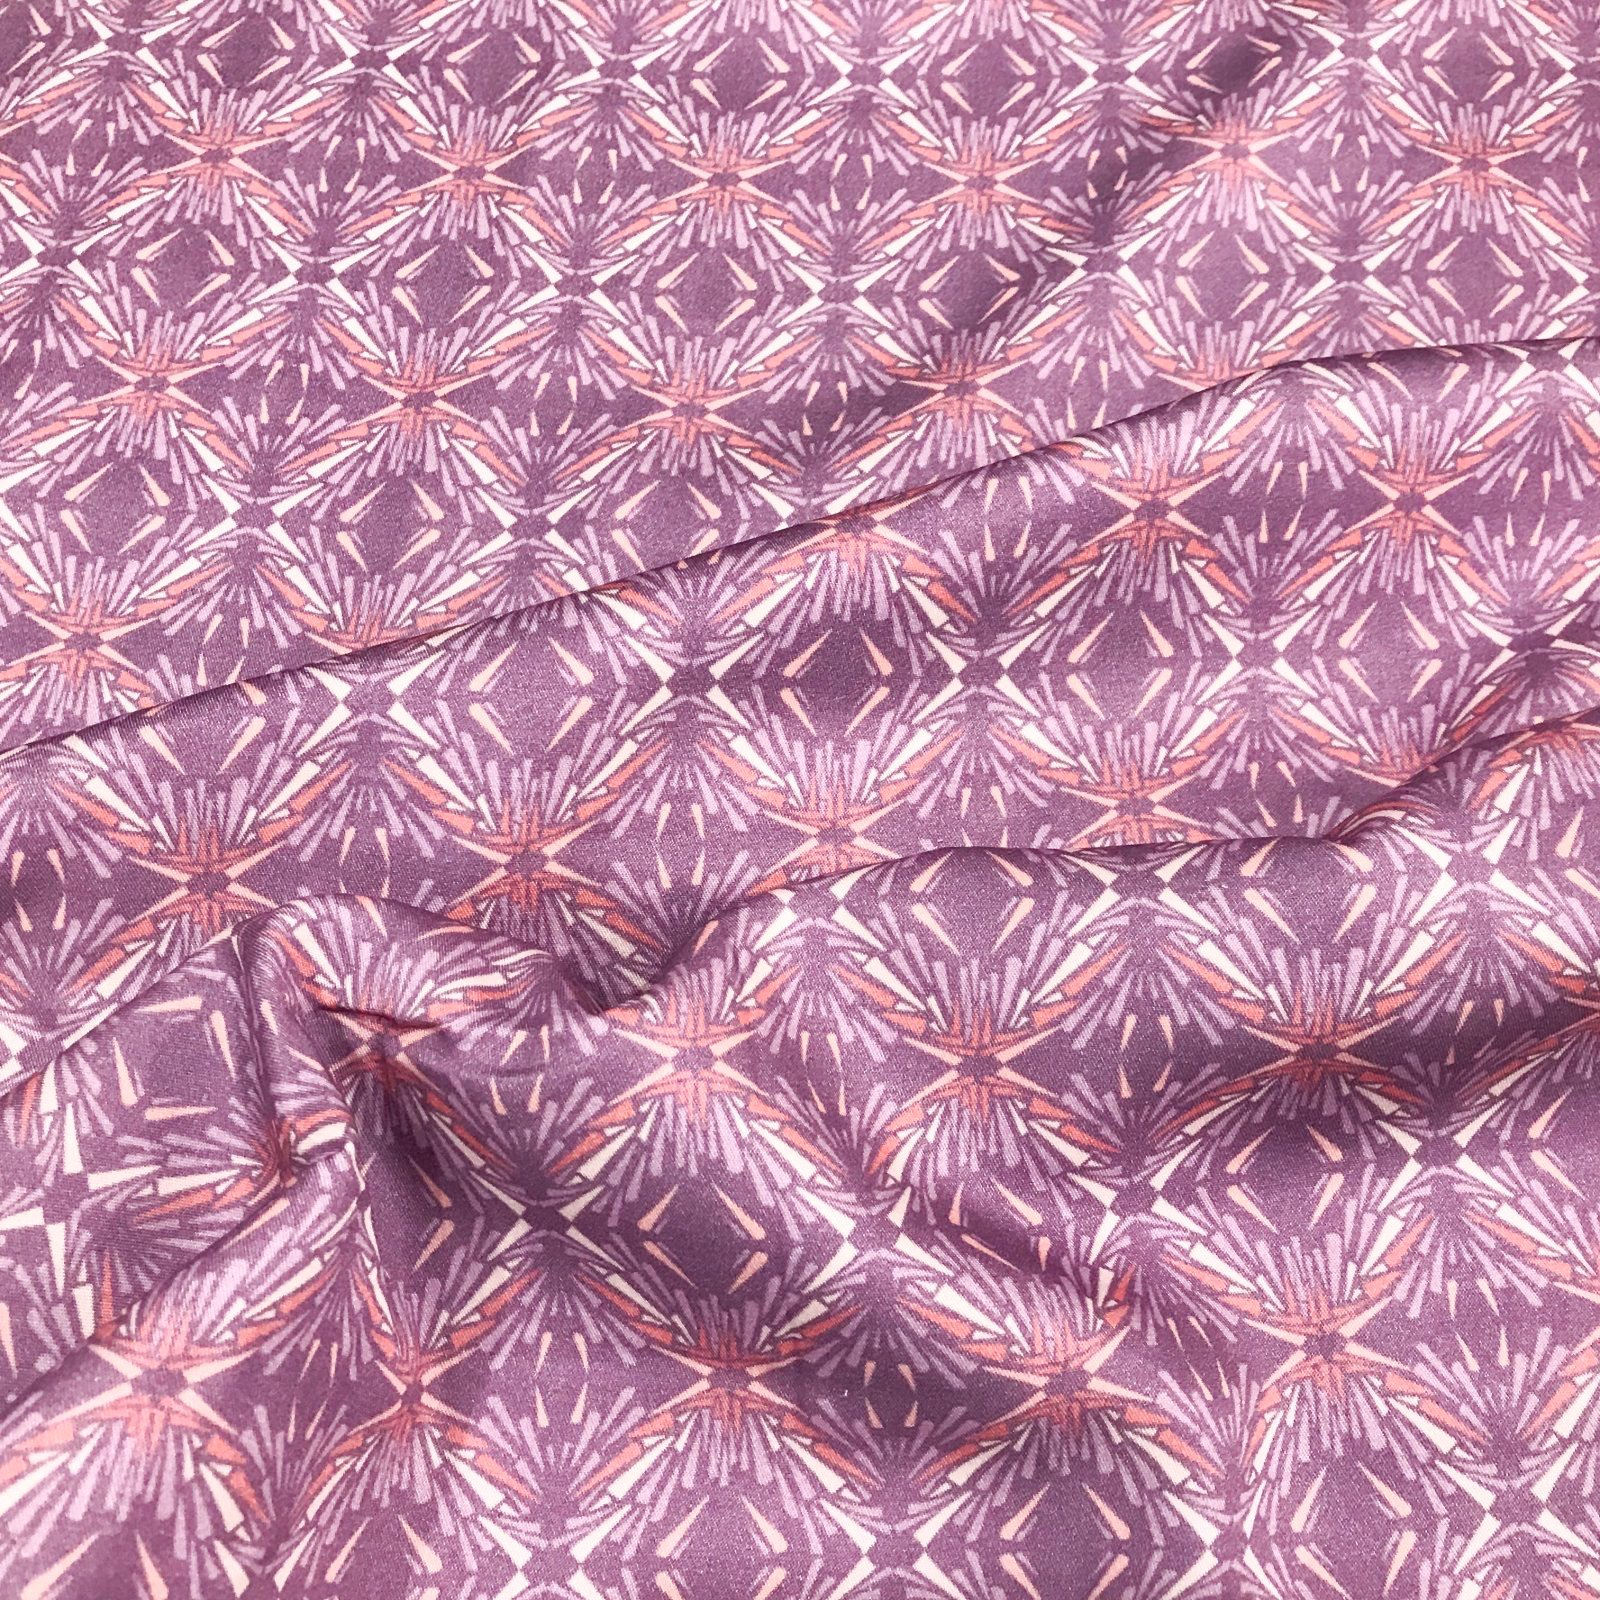 Organic Tencel Twill - Thick as Thorns - Lavender